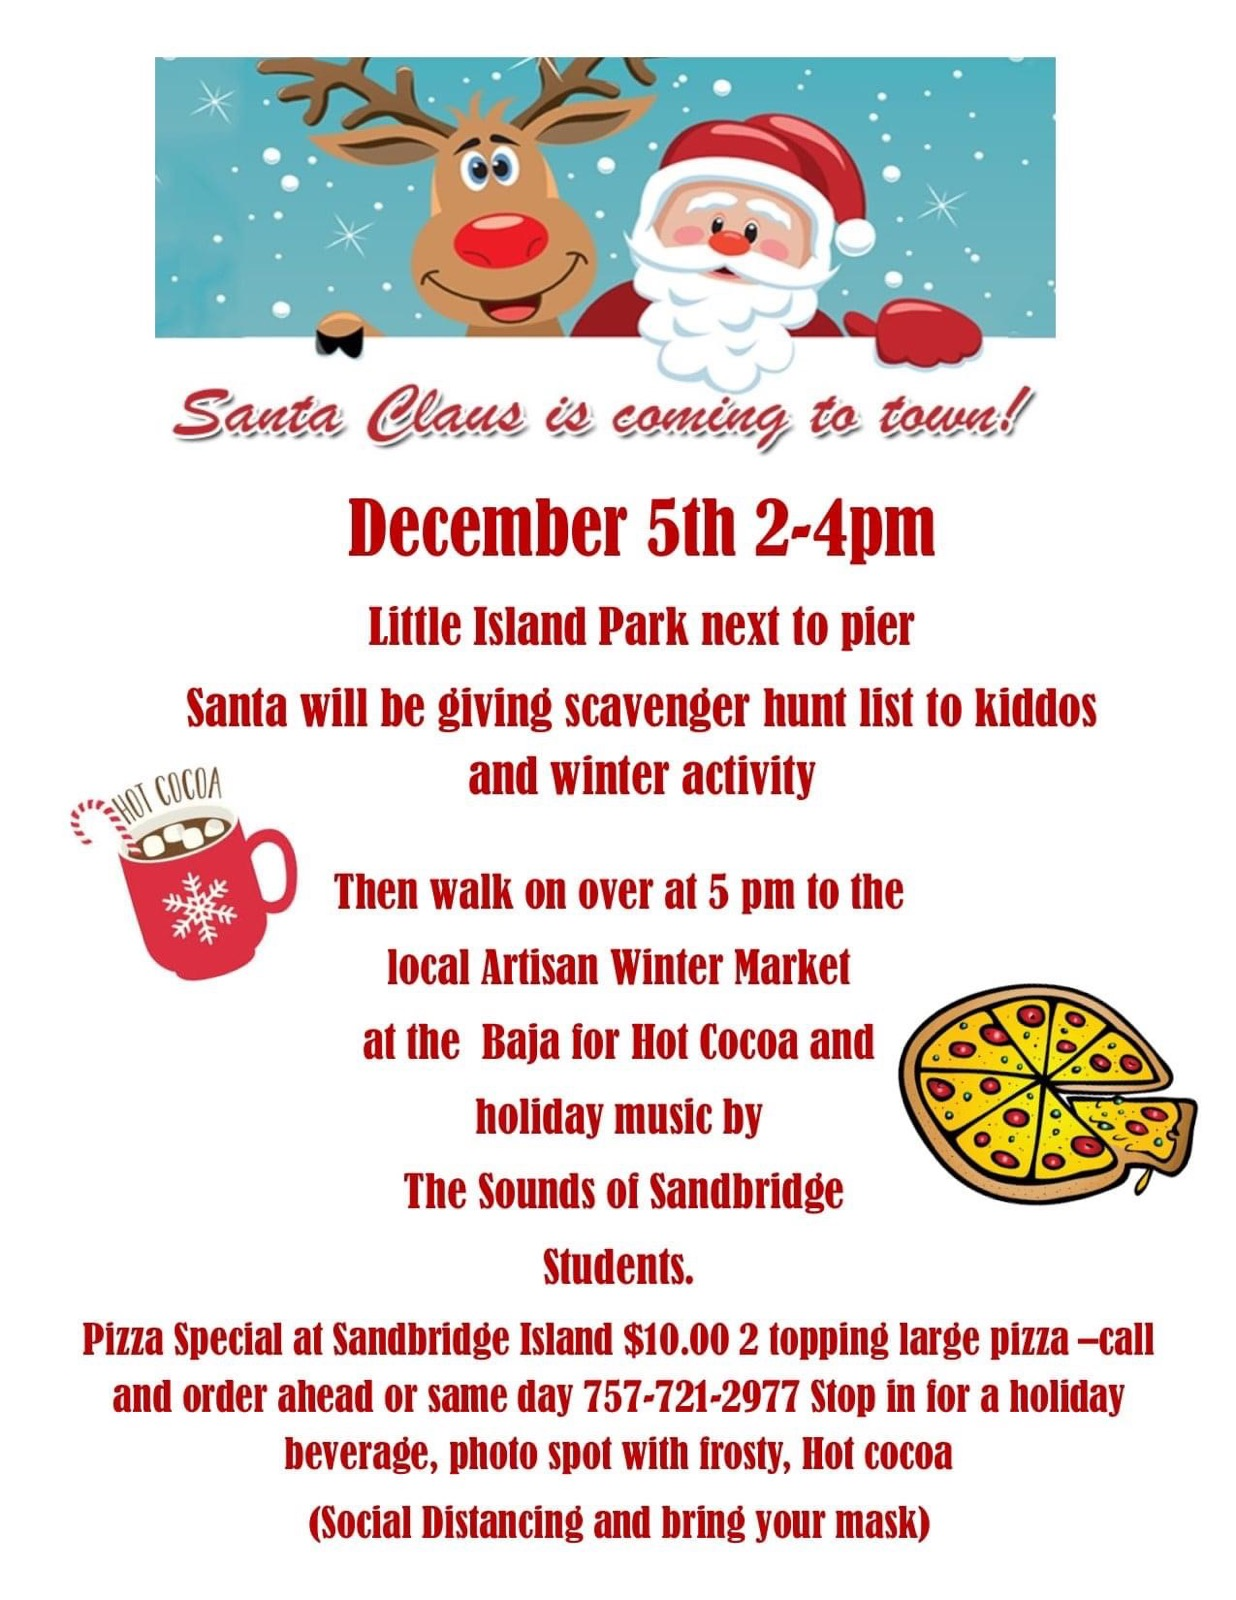 Santa Claus is coming to Sandbridge December 5th!